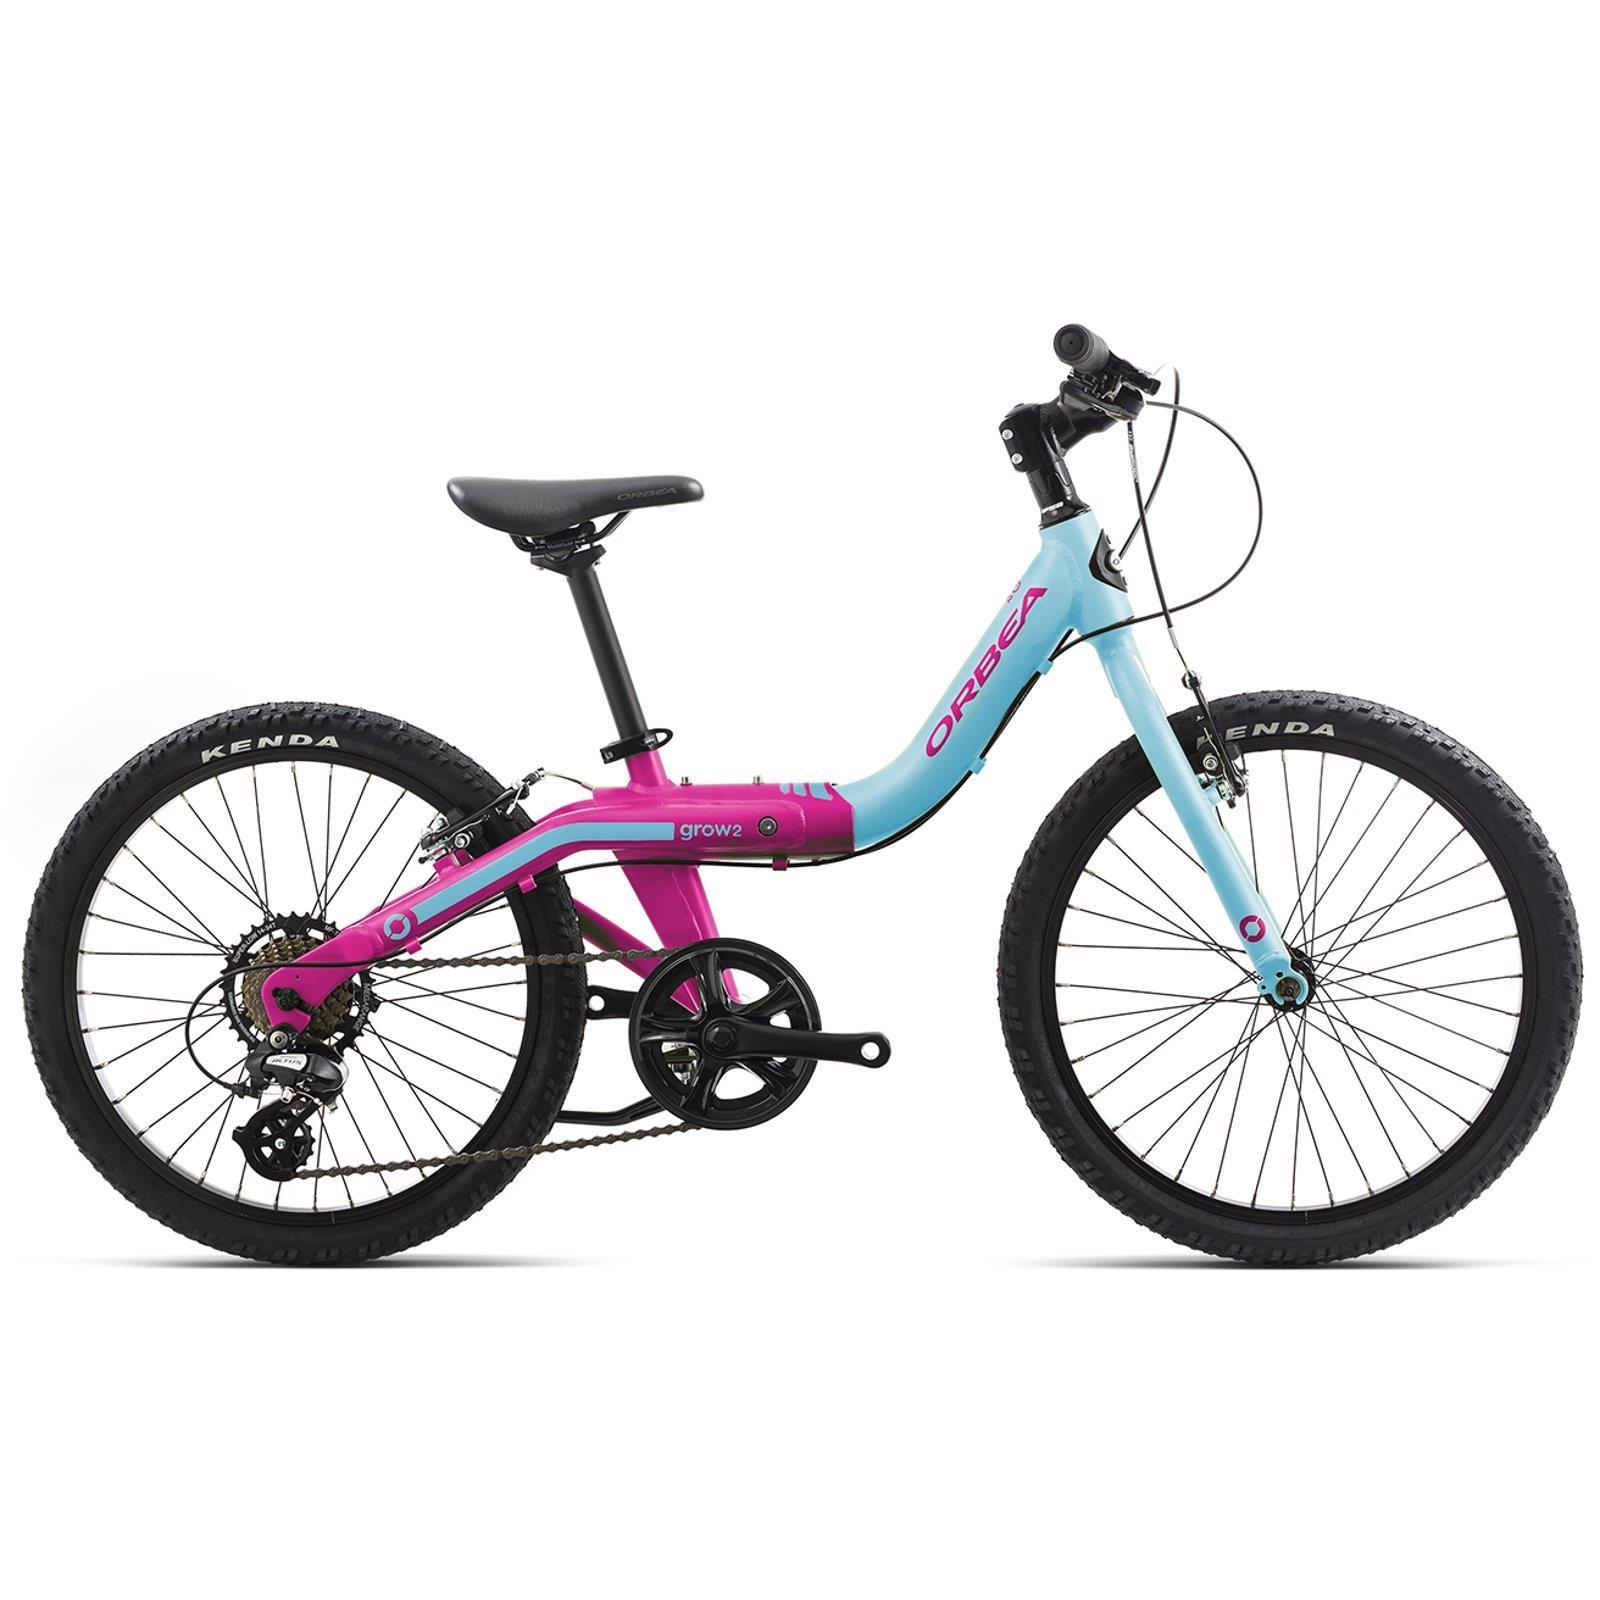 orbea grow 2 kinder fahrrad 20 zoll 7 gang rad aluminium. Black Bedroom Furniture Sets. Home Design Ideas